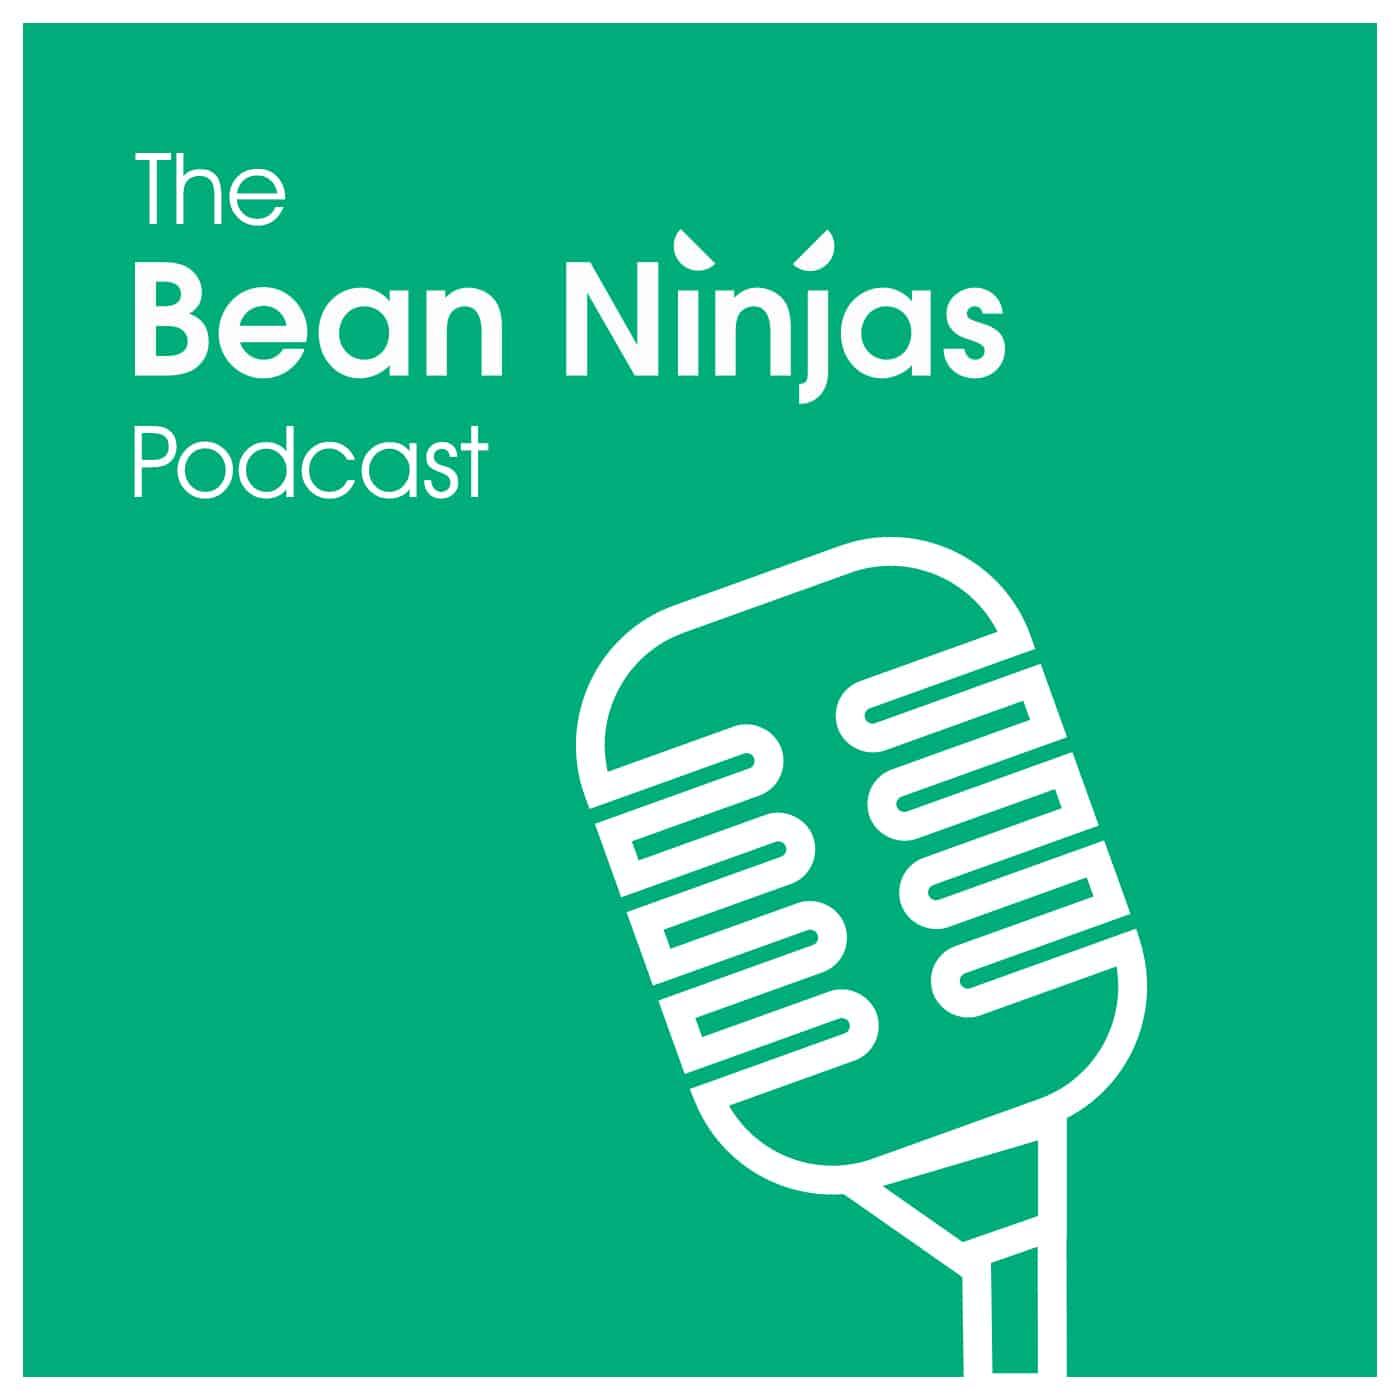 The Bean Ninjas Podcast